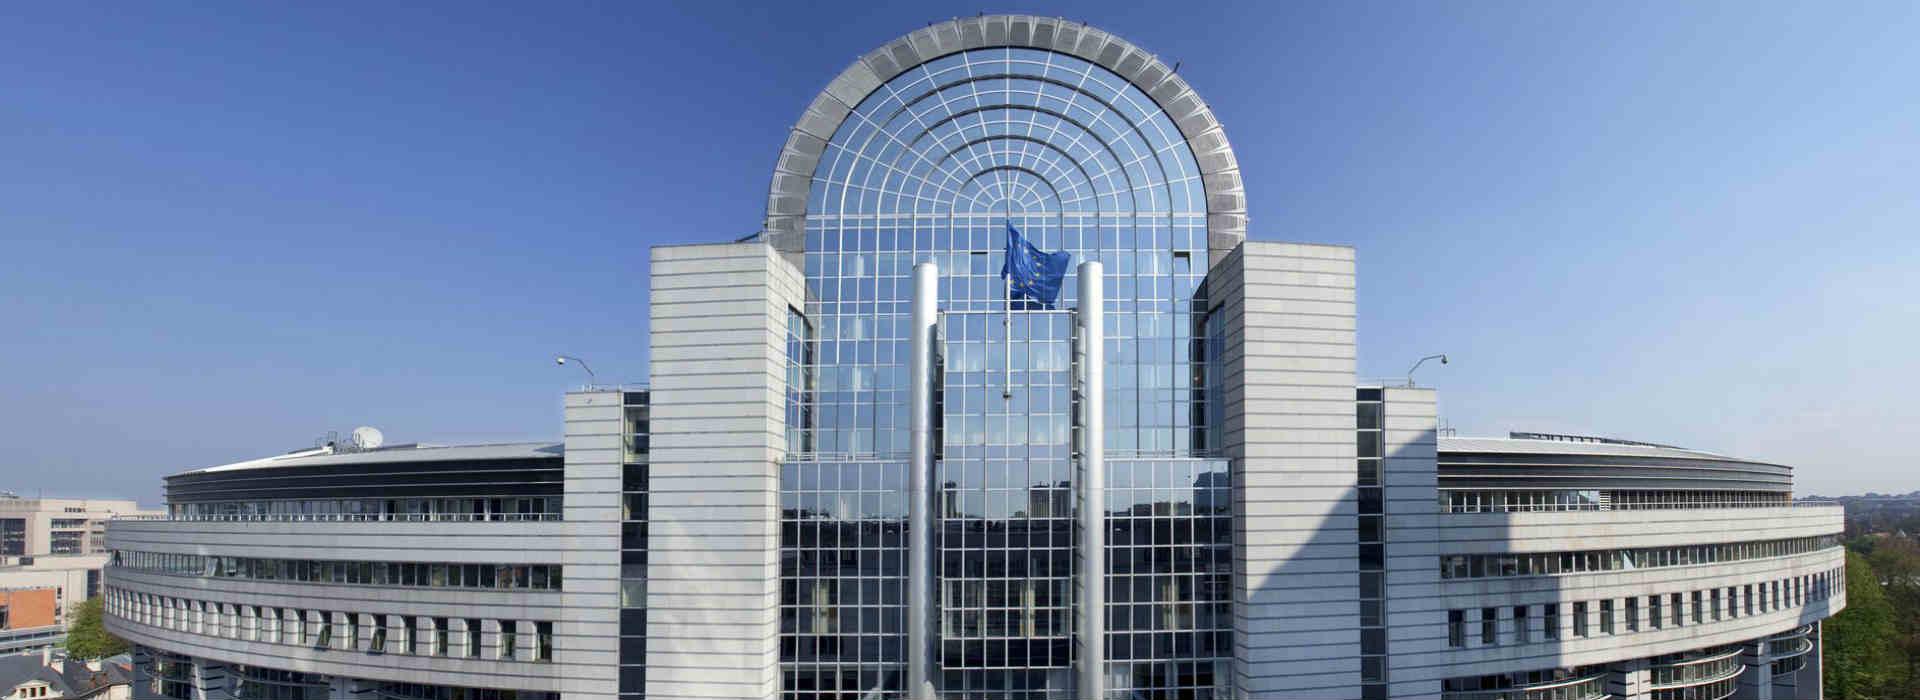 Sede parlamento Bruxelles - Brexit